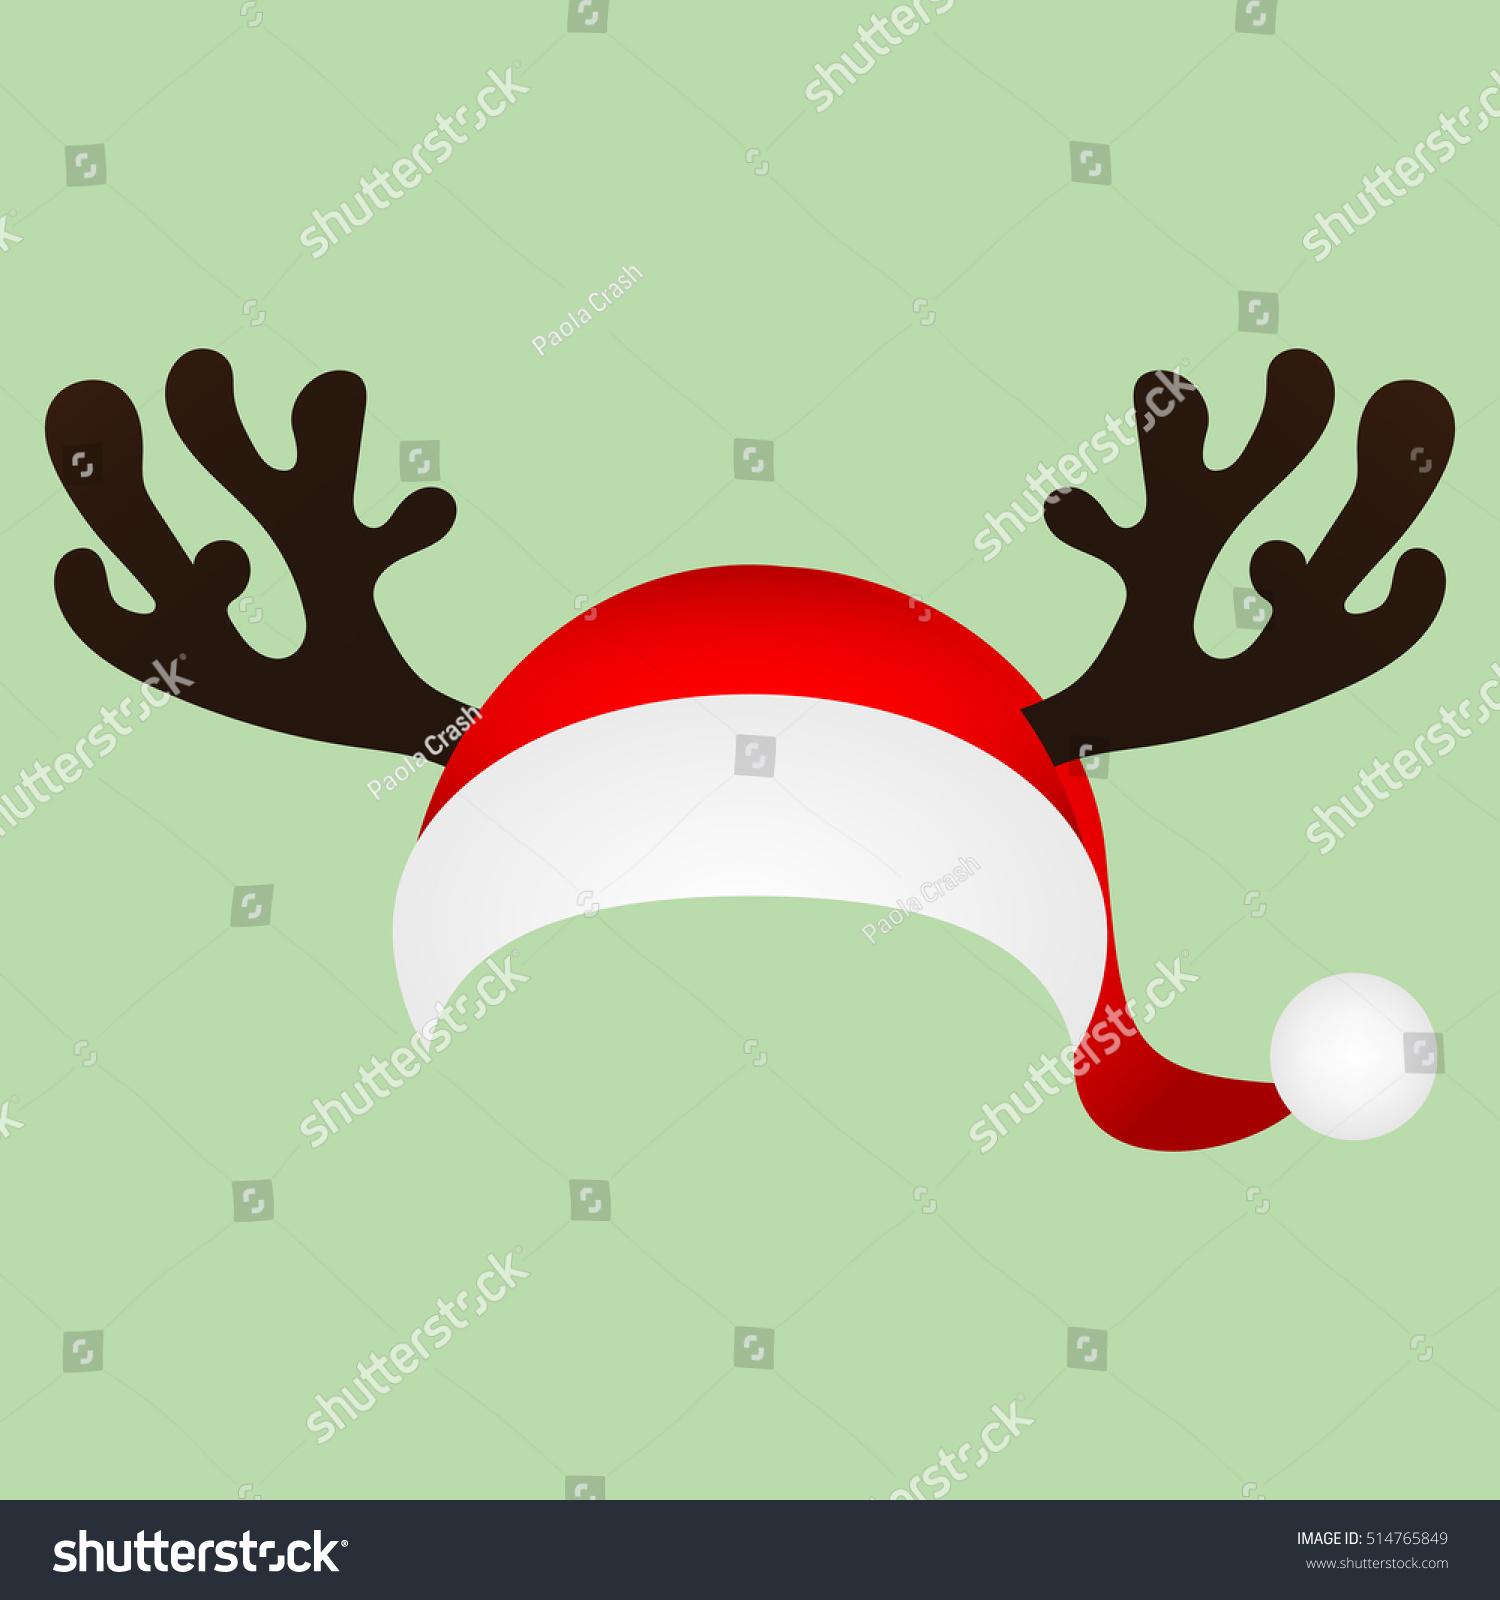 Template Fun Photo Santa Claus Hat Stock Illustration 514765849 ...